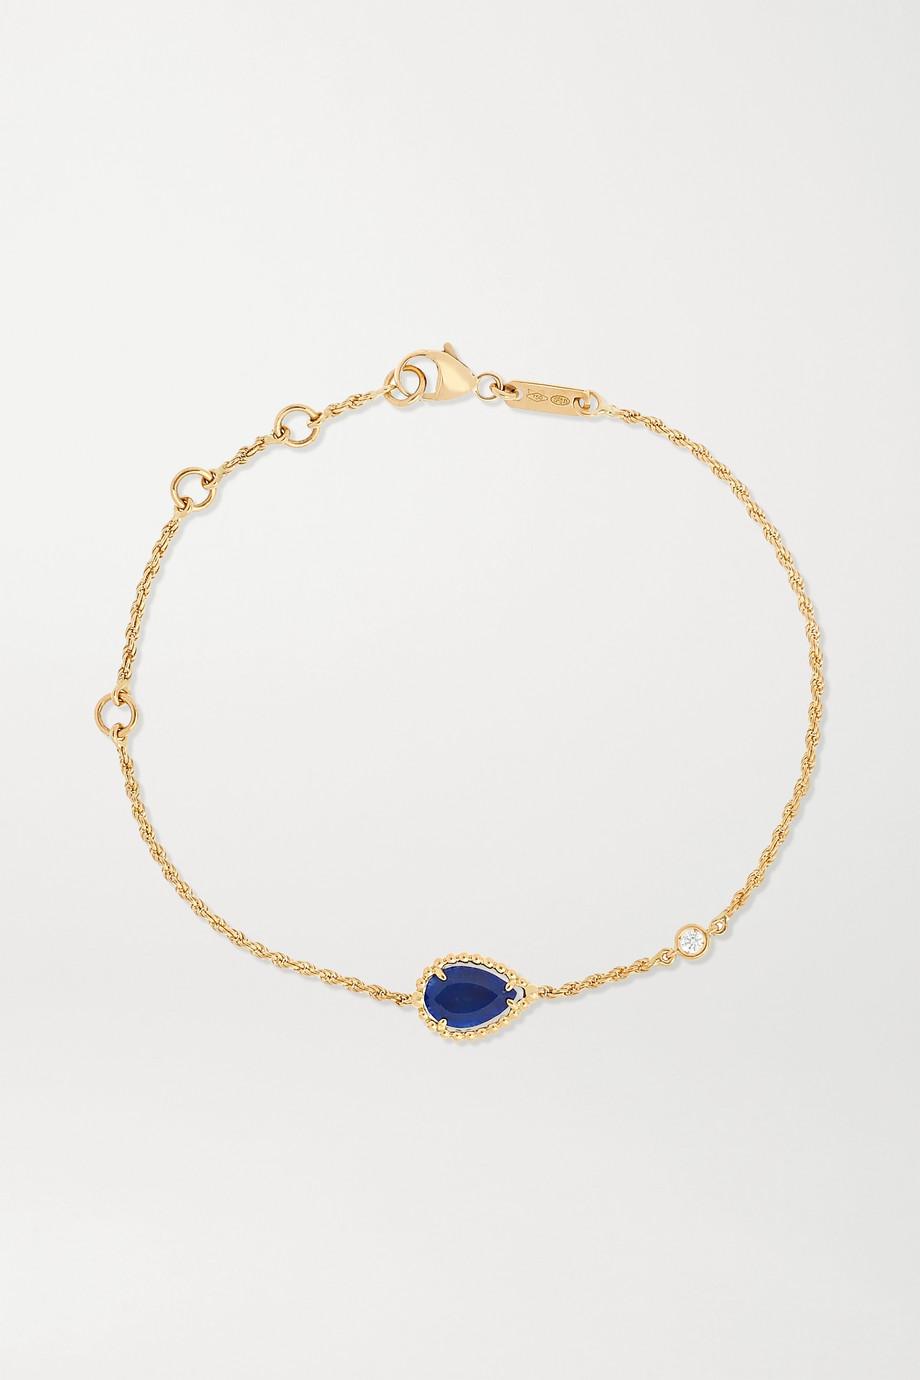 Boucheron Serpent Bohème 18-karat gold, lapis lazuli and diamond bracelet